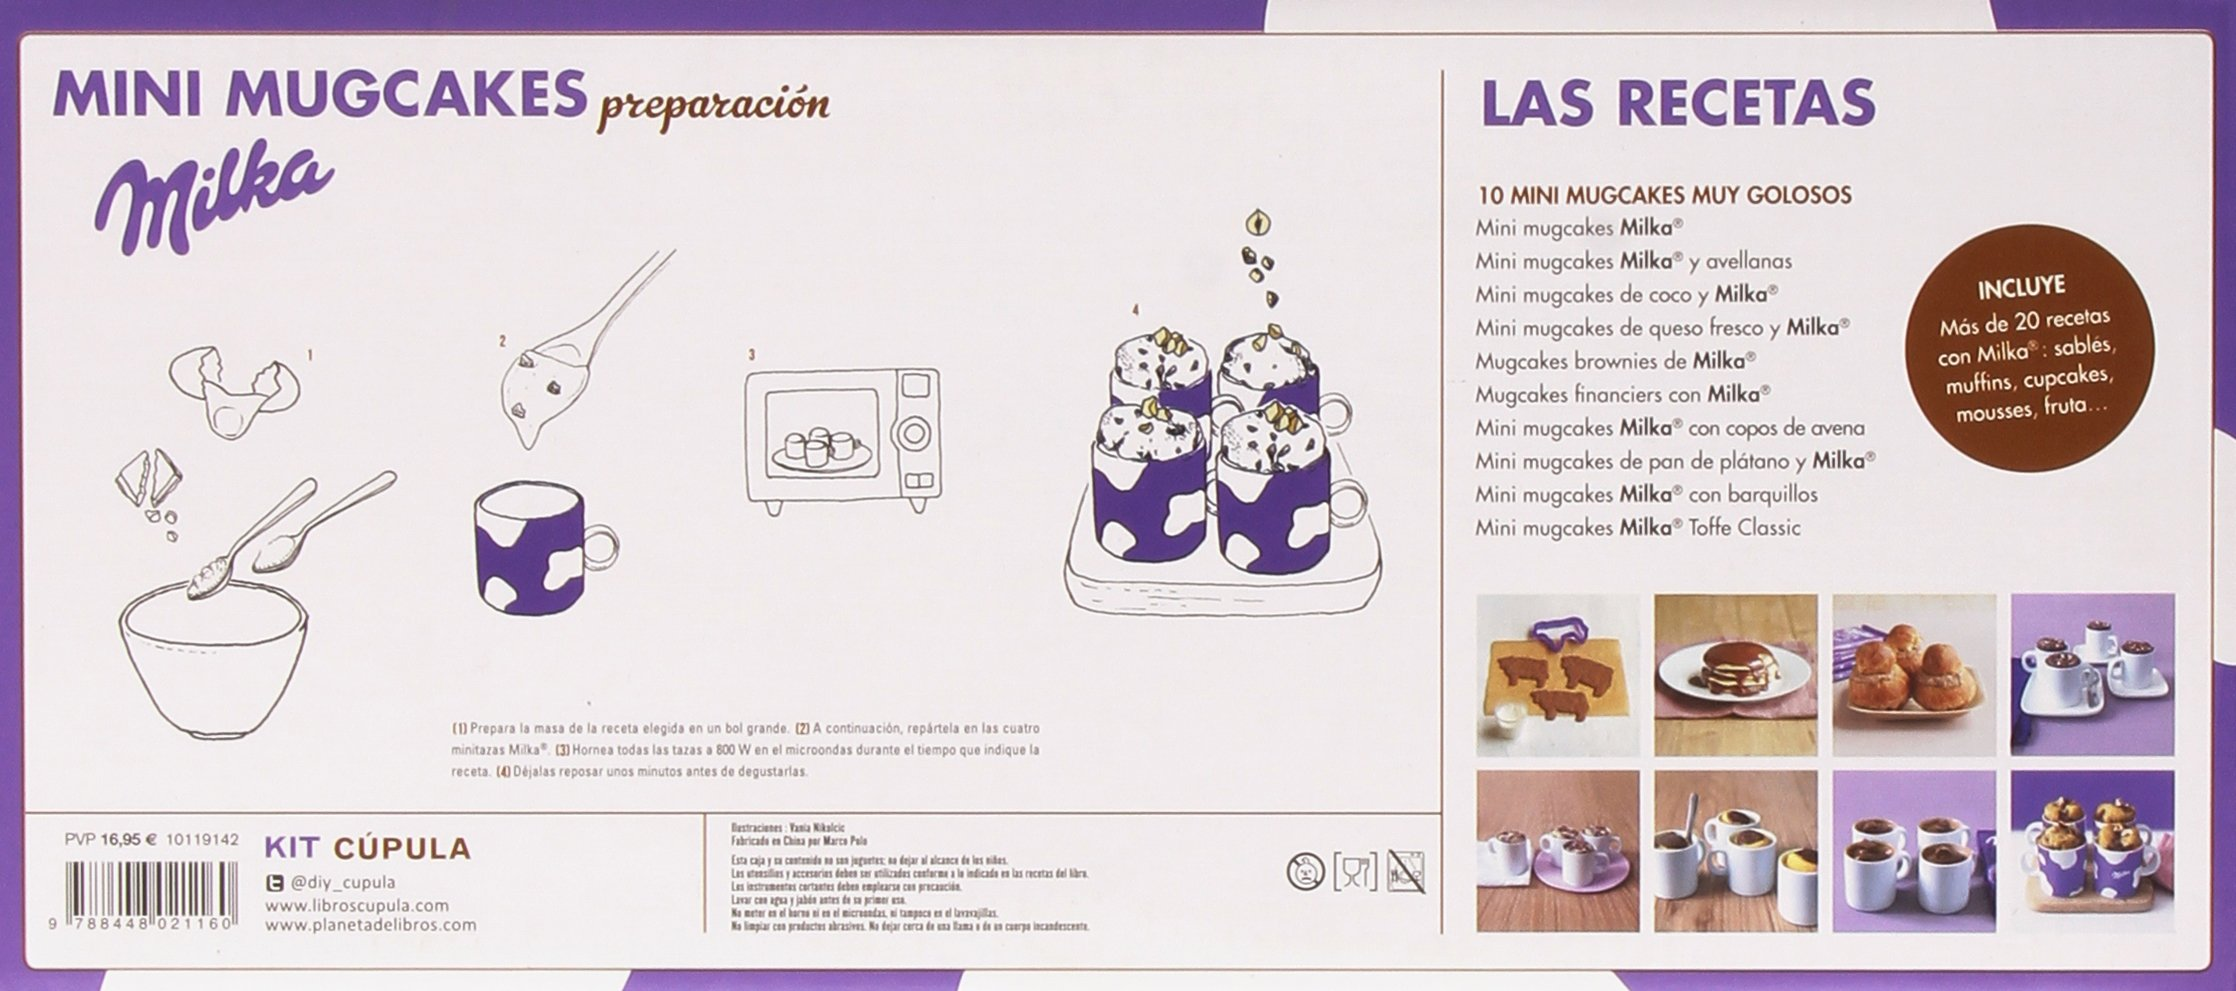 Kit Mini mugcakes Milka®: Coulants y minipasteles listos en menos de 5 minutos Kits Cúpula: Amazon.es: Claire Guignot, Parangona Realització Editorial S.L.: ...